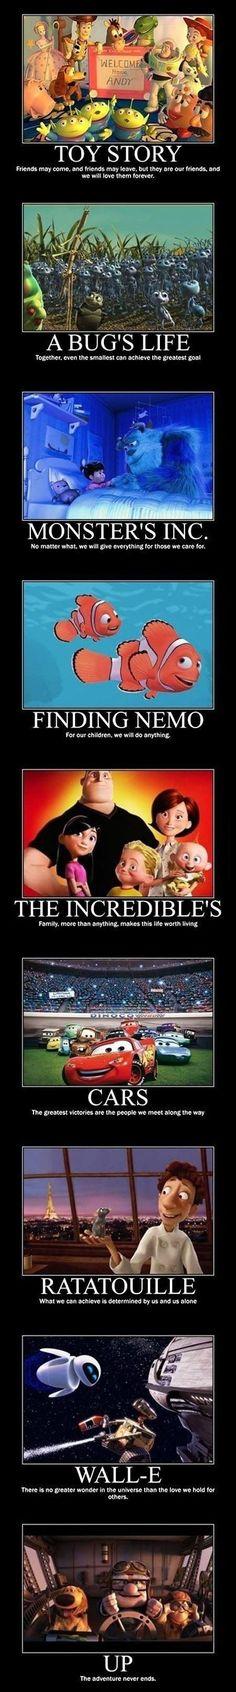 Things Disney Taught Me